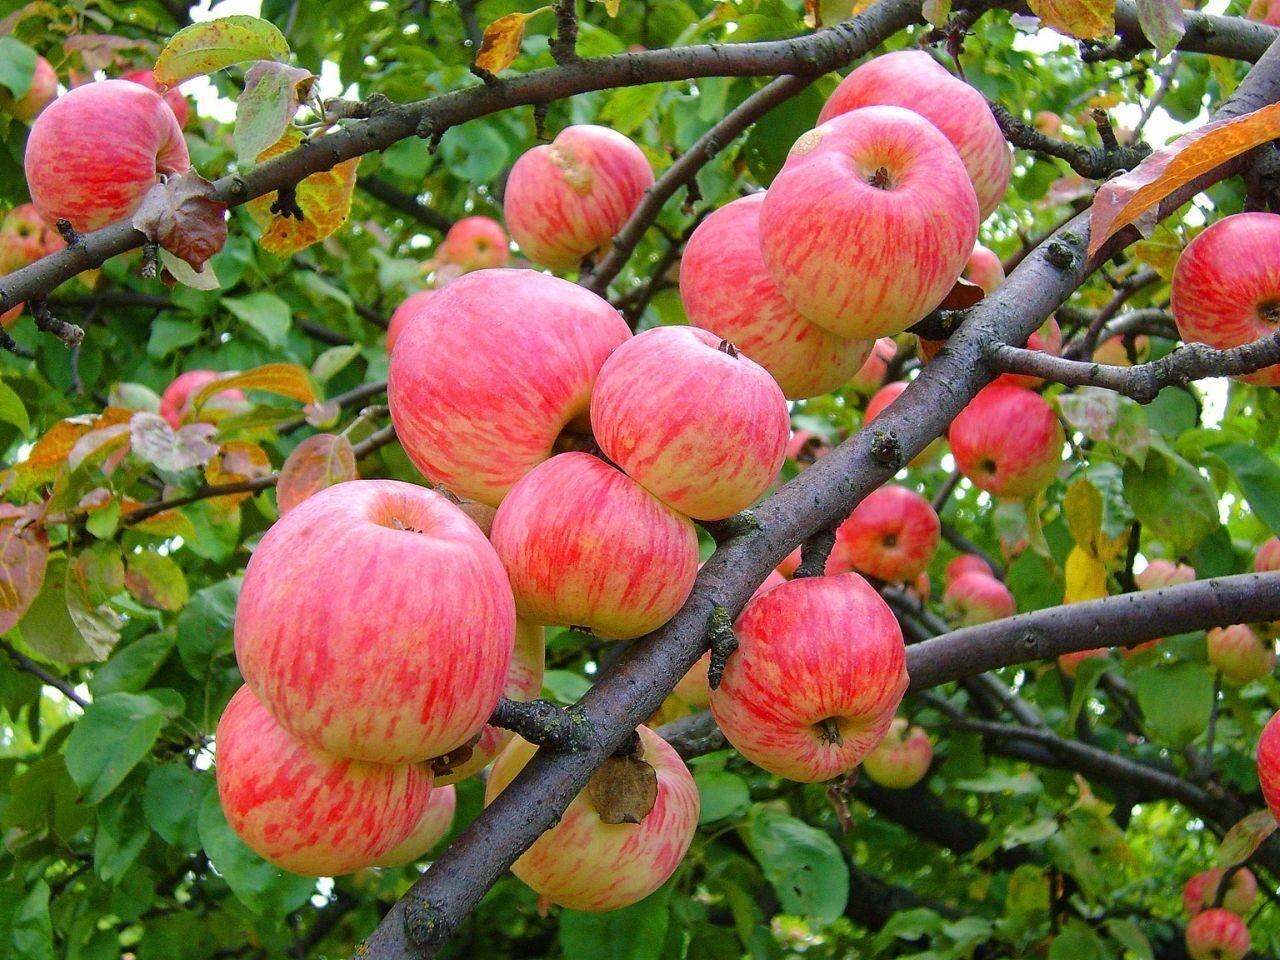 Яблоки Мельба картинки 5